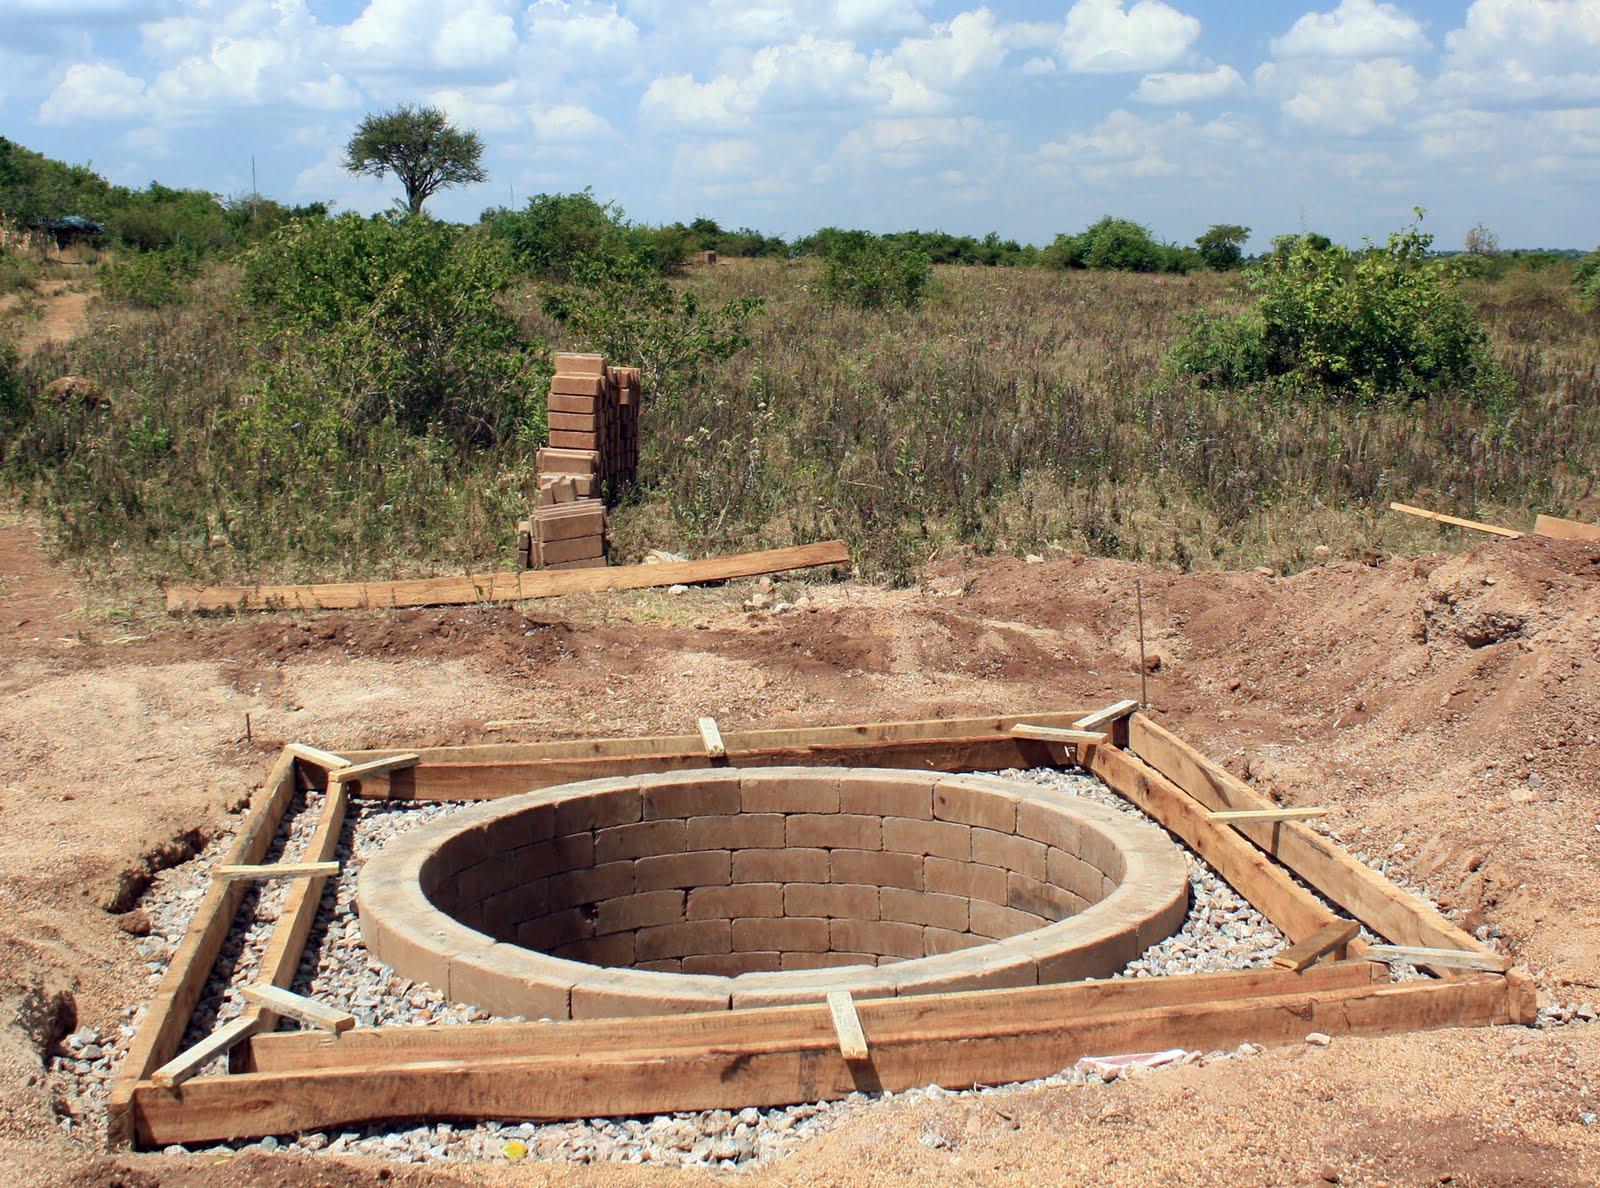 Pit Toilets Construction : Roche health center pit latrine underway